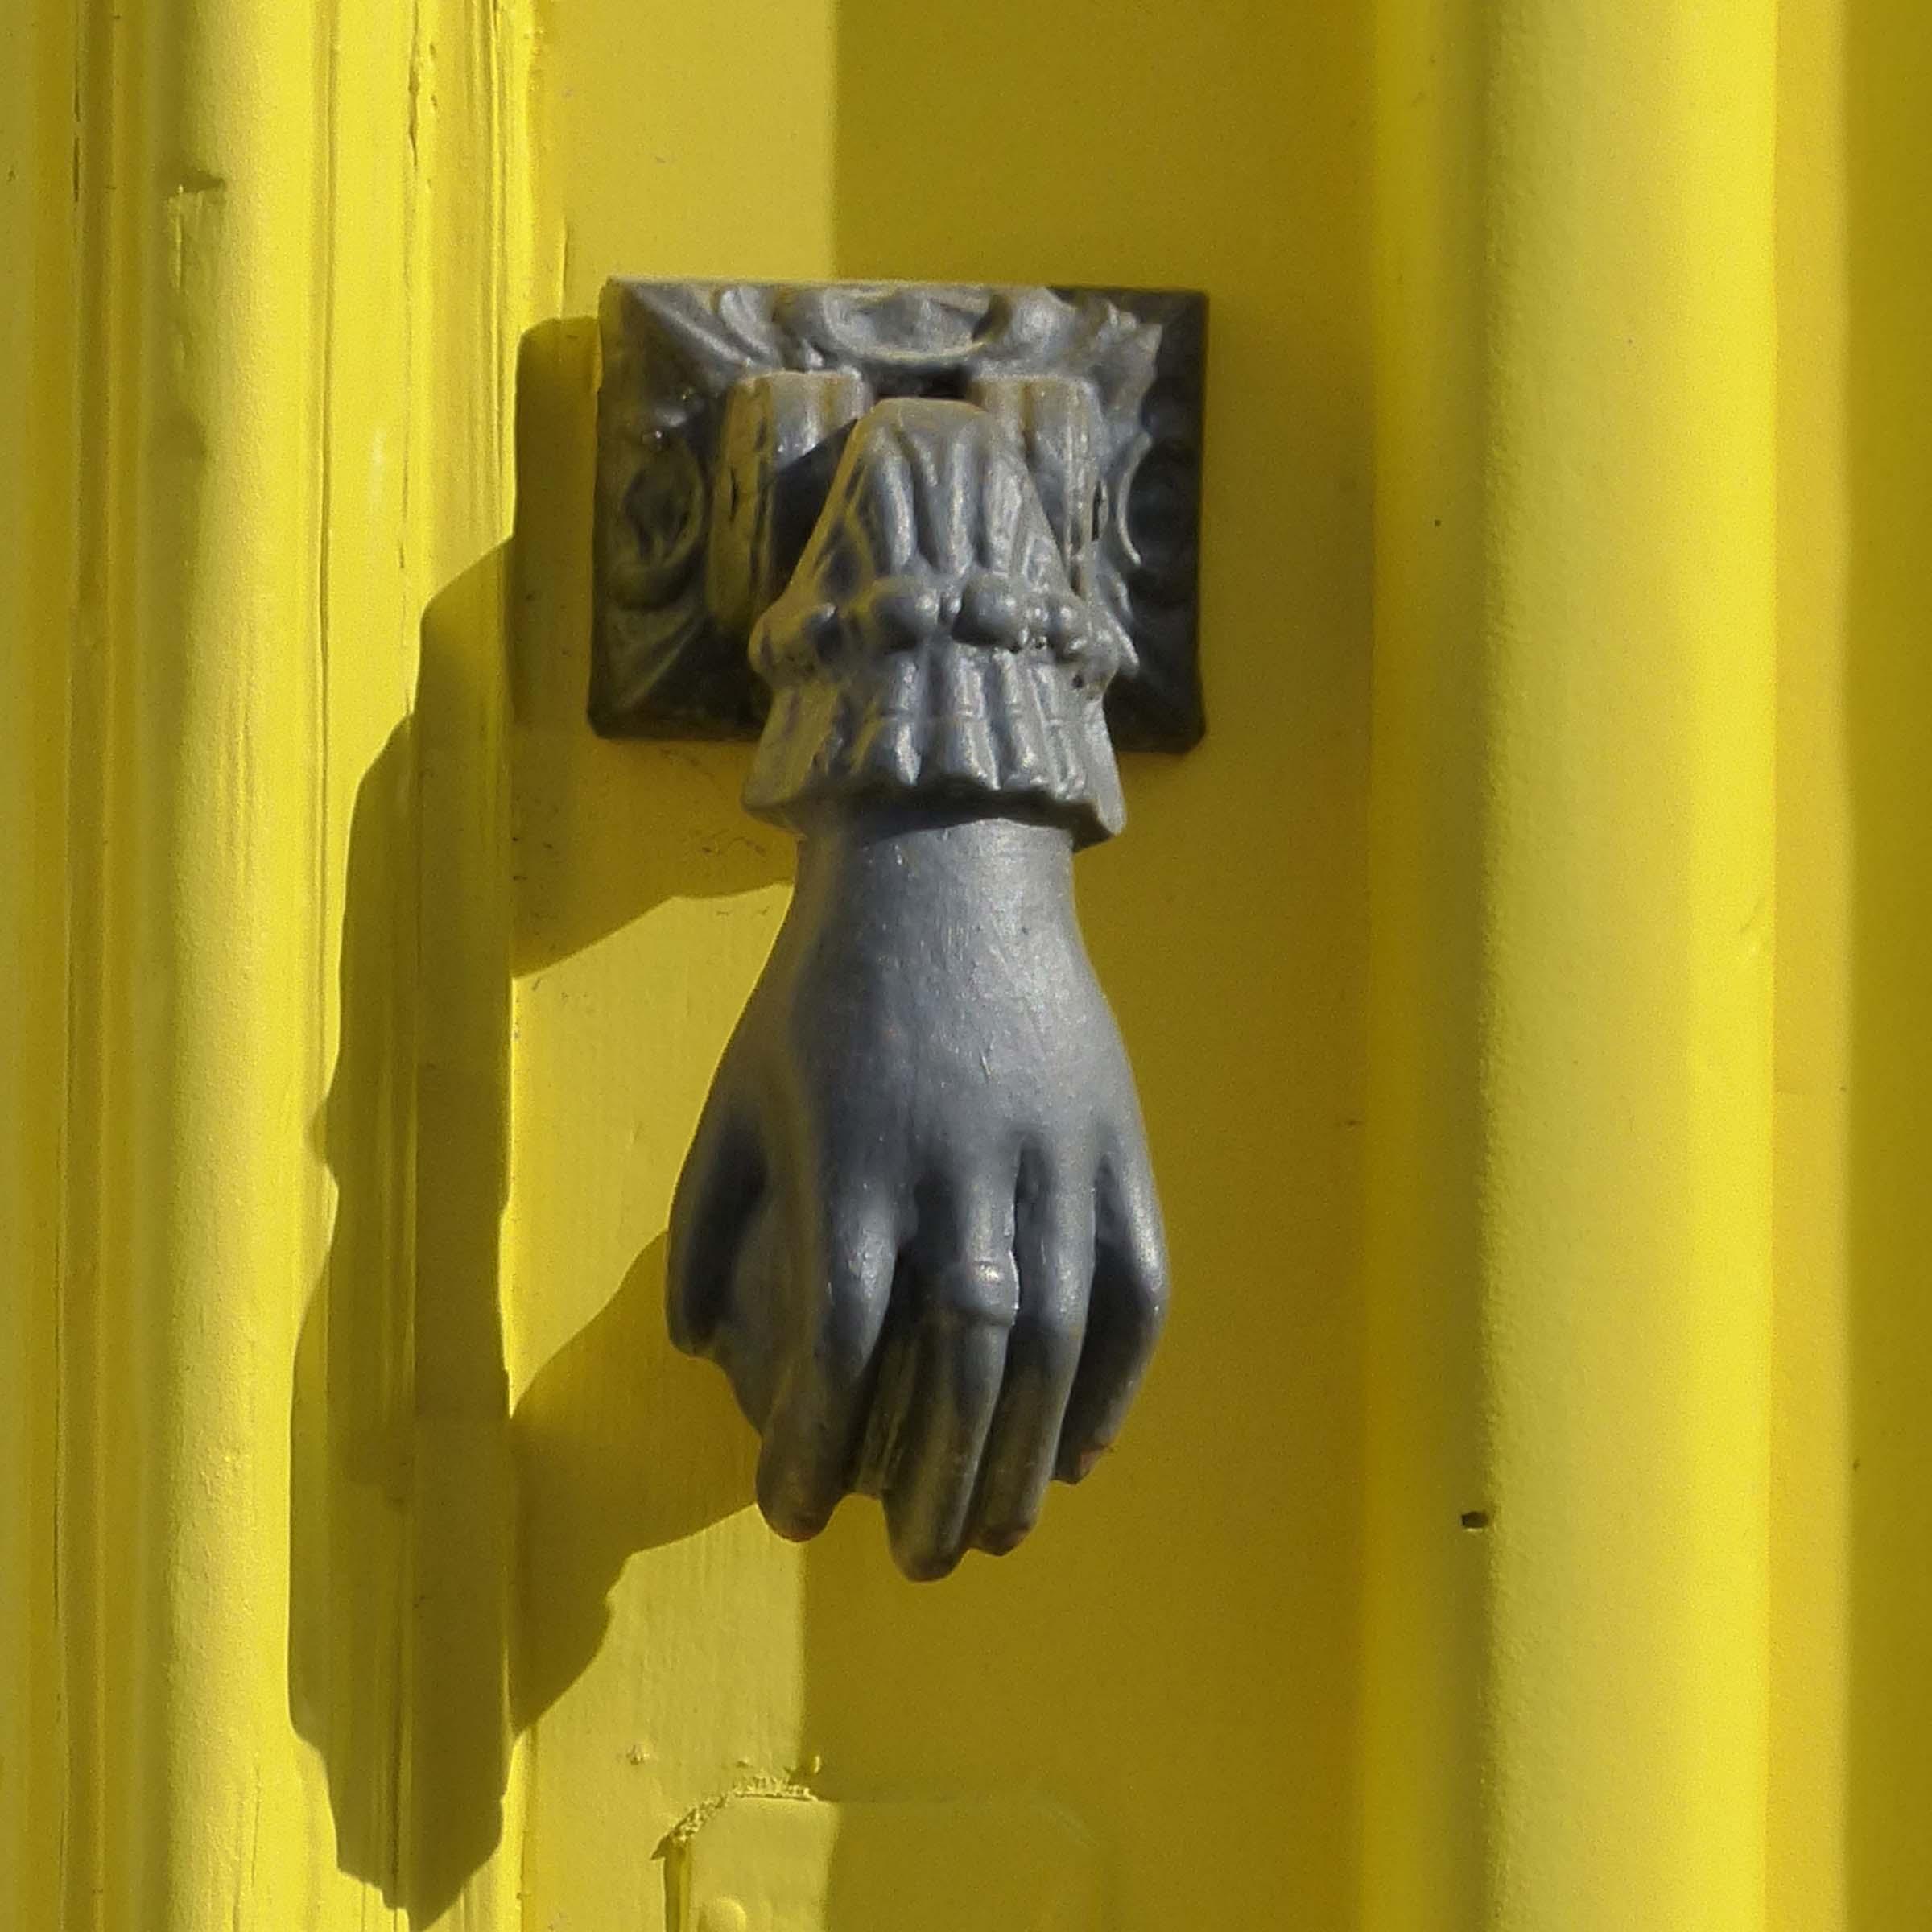 Yellow door with hand-shaped knocker